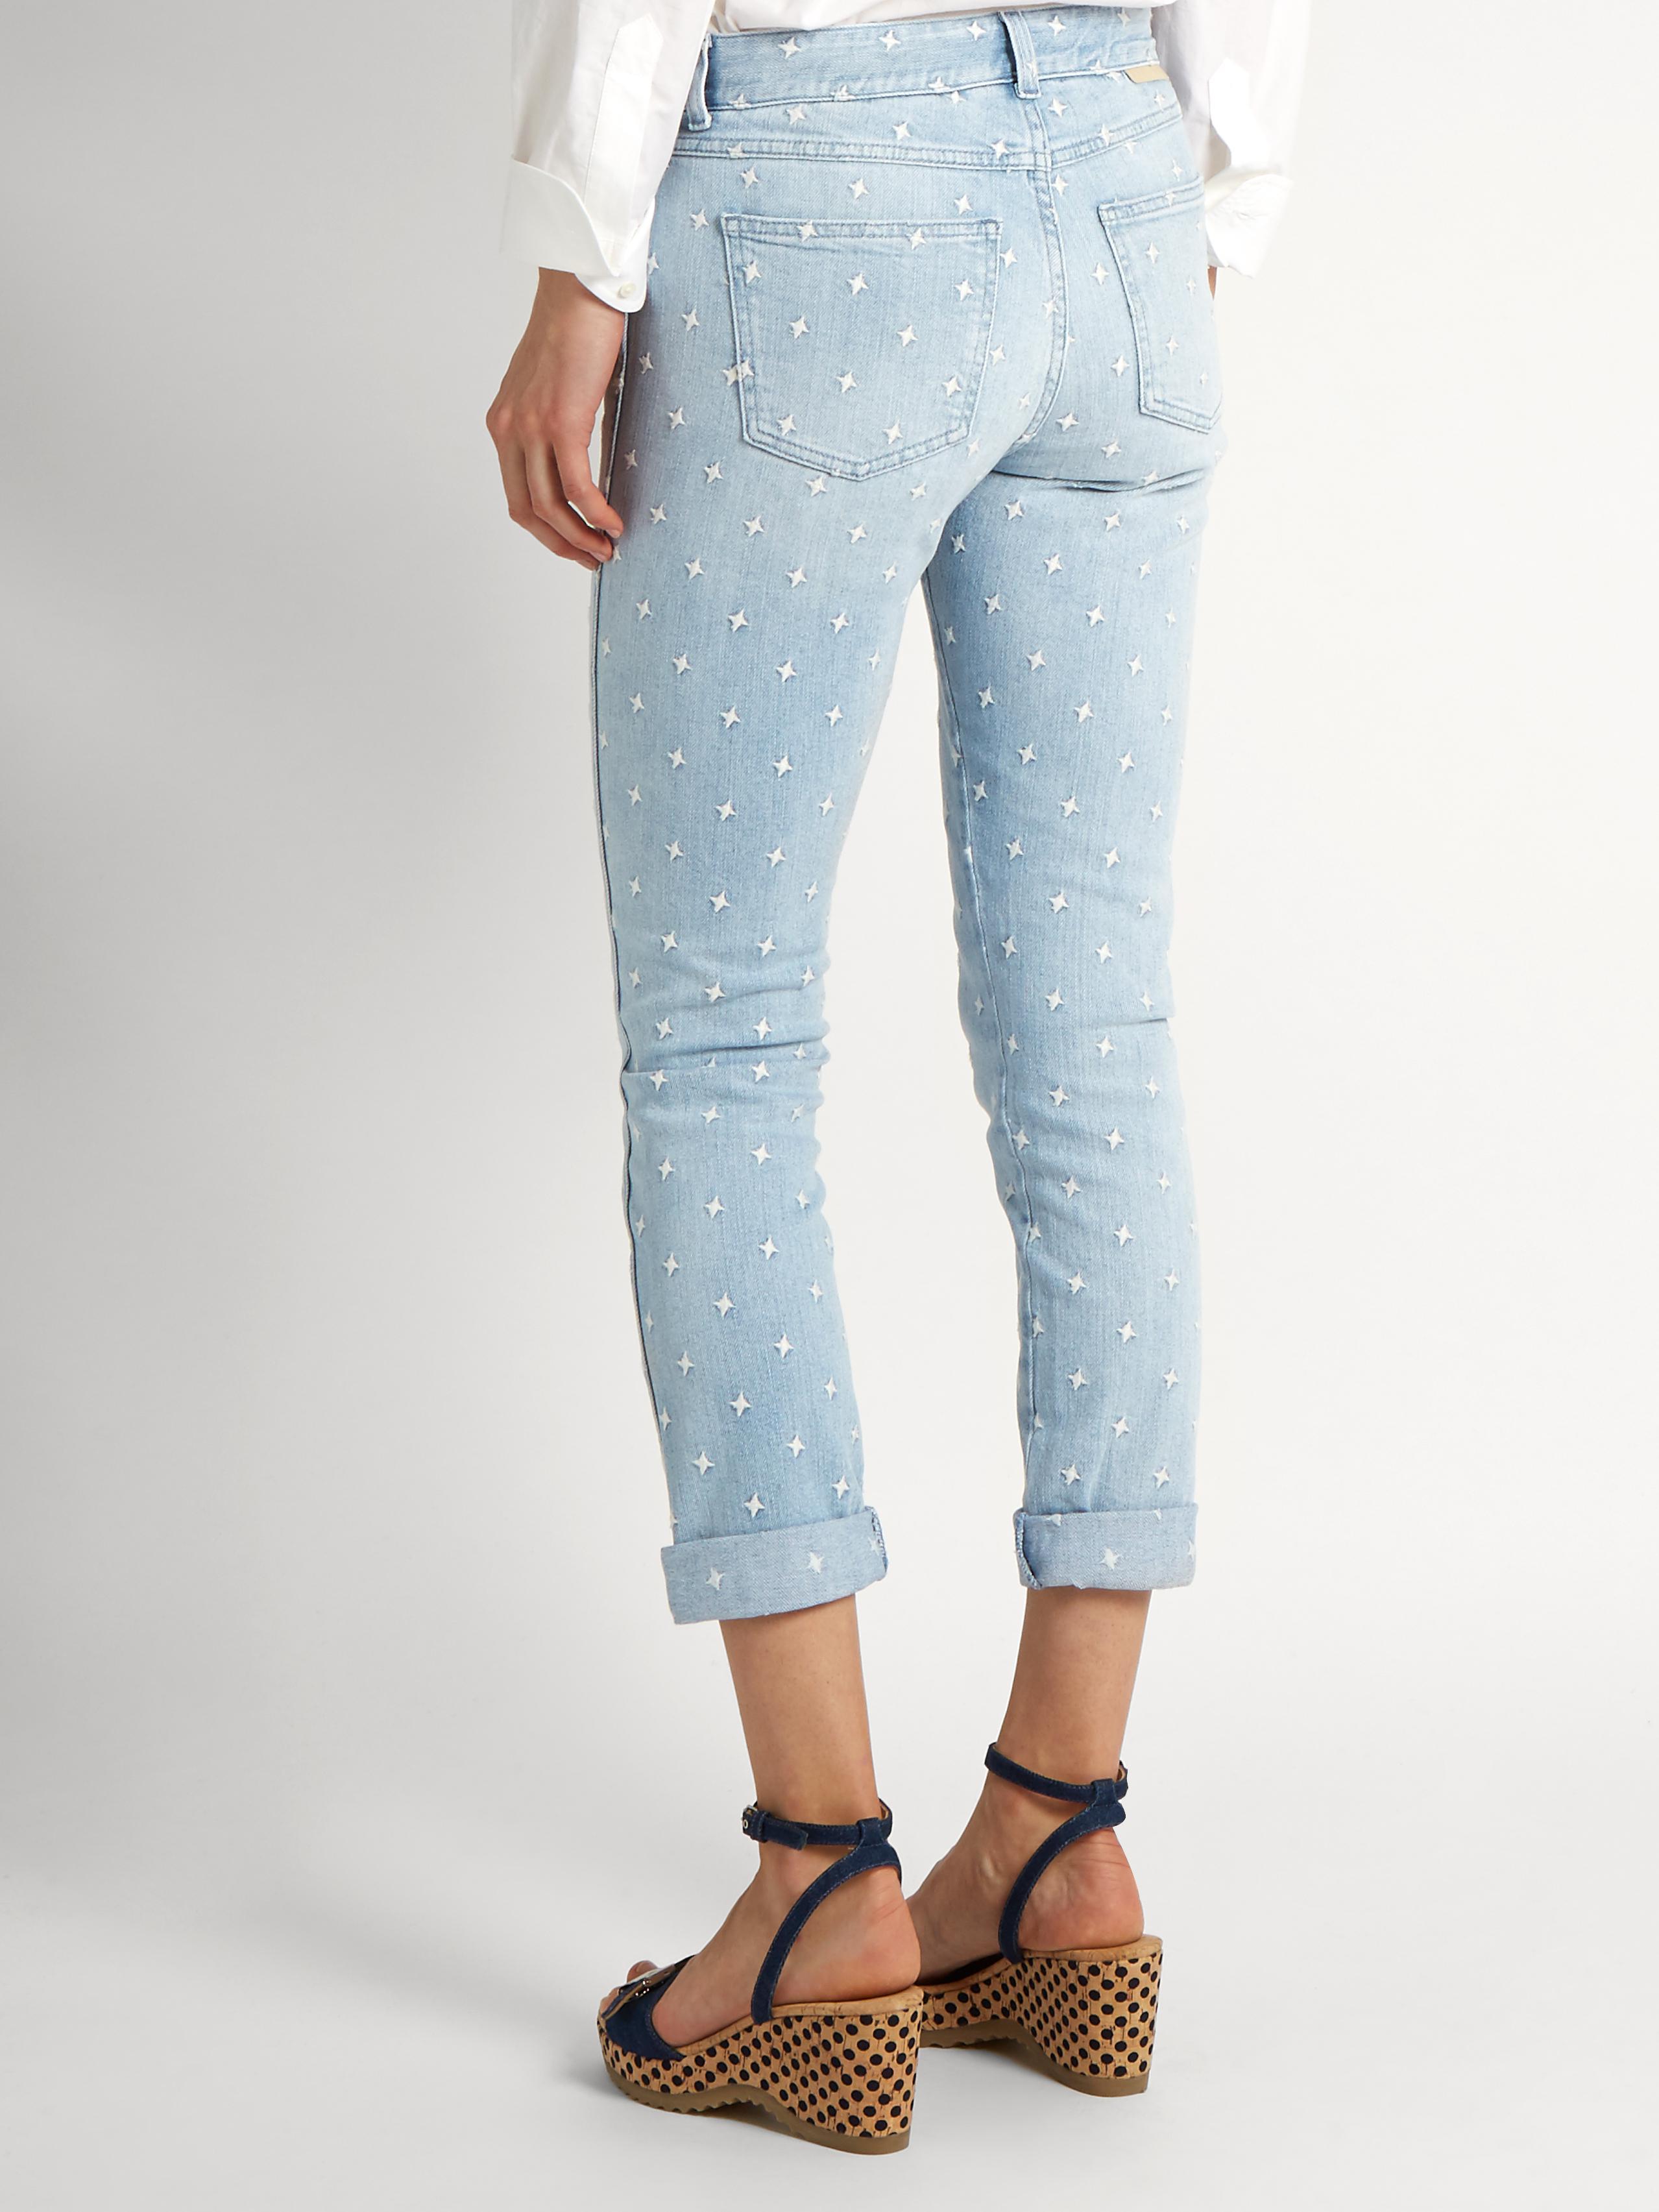 Cheap Sale Enjoy Release Dates Sale Online Distressed Slim Boyfriend Jeans - Light denim Stella McCartney Browse Online 6MsCaPx